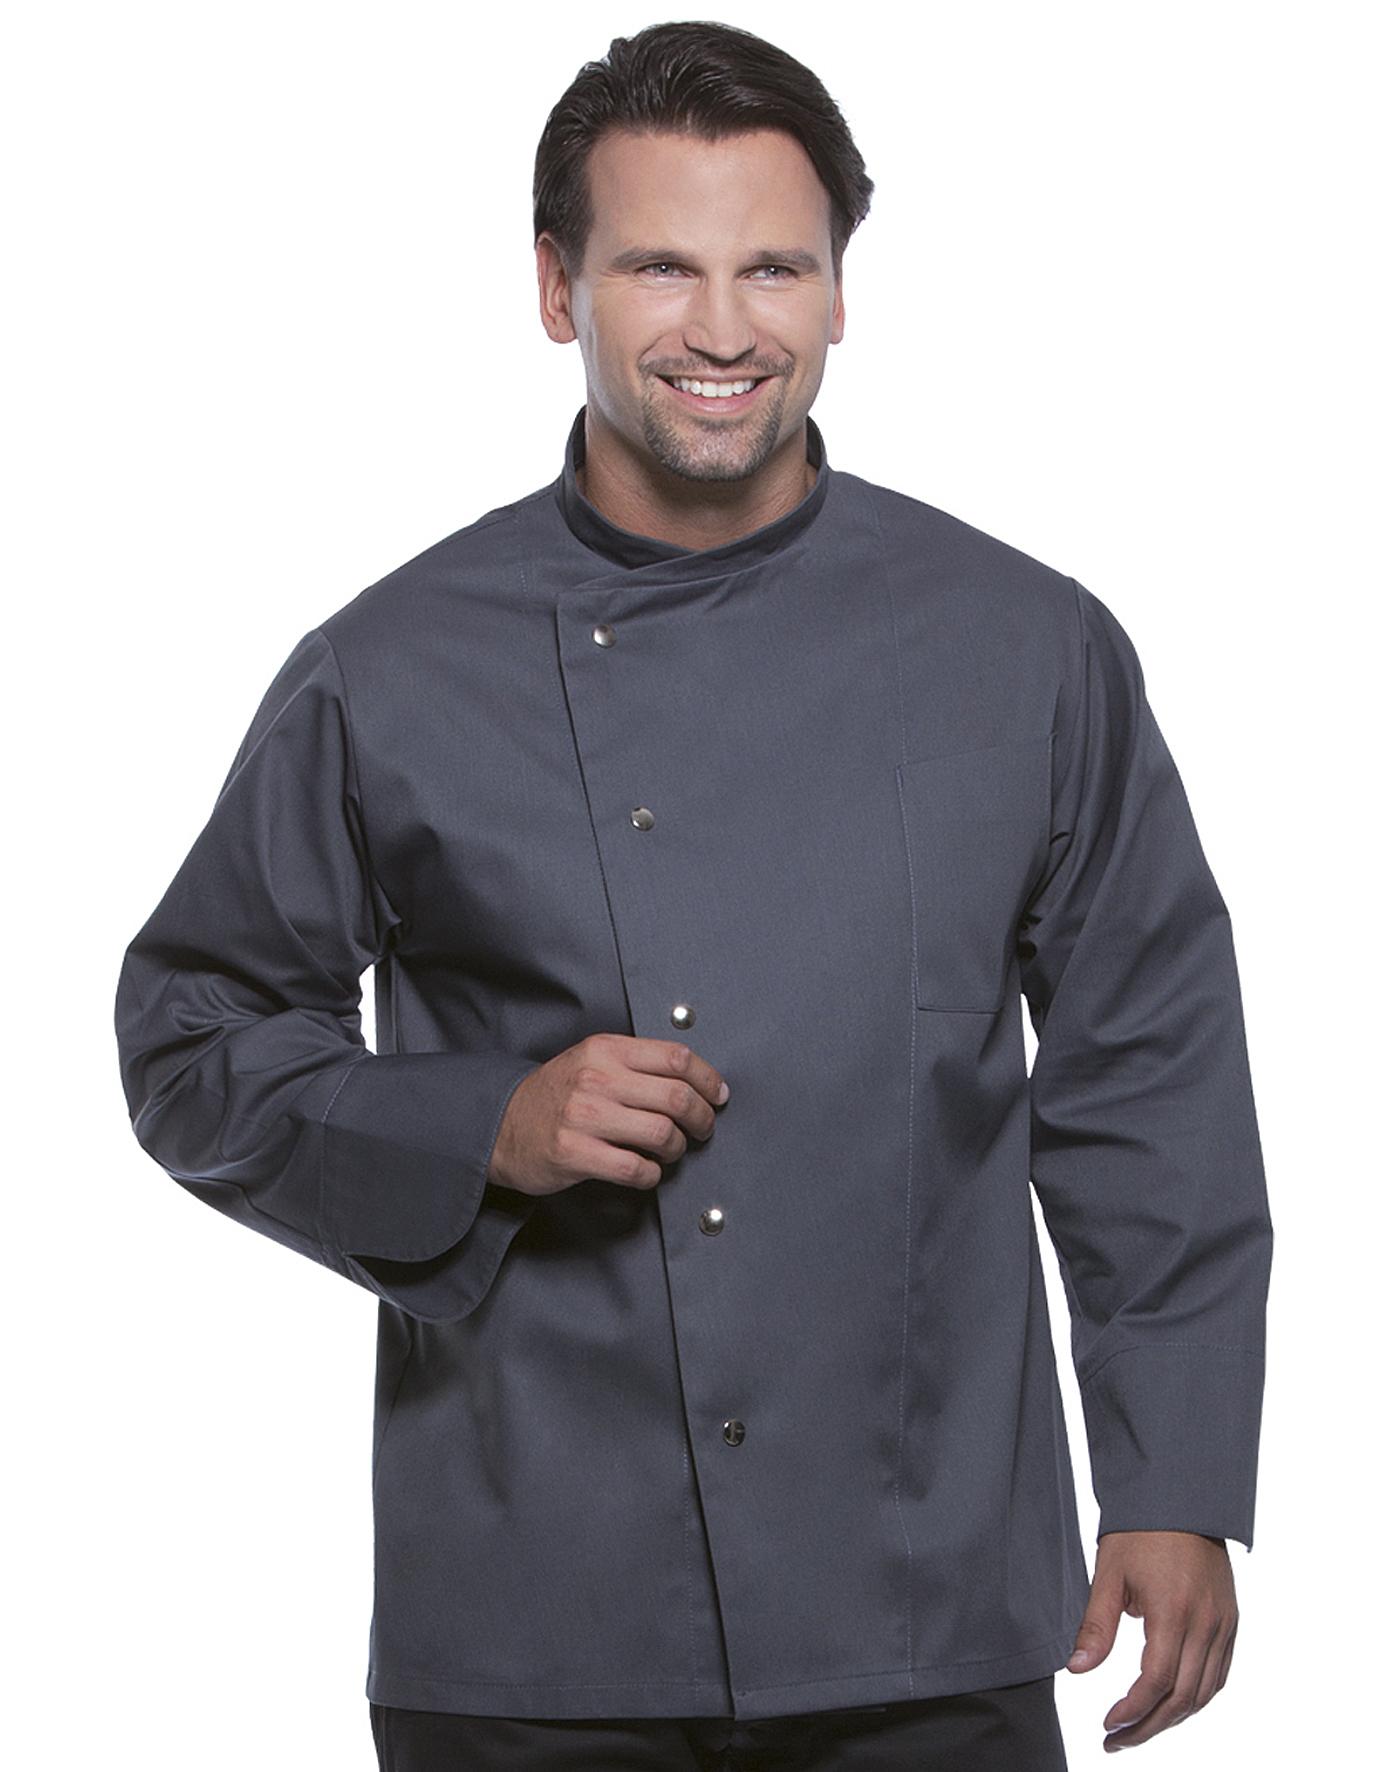 Kochjacken Chef Jacket Lars Long Sleeve KARLOWSKY